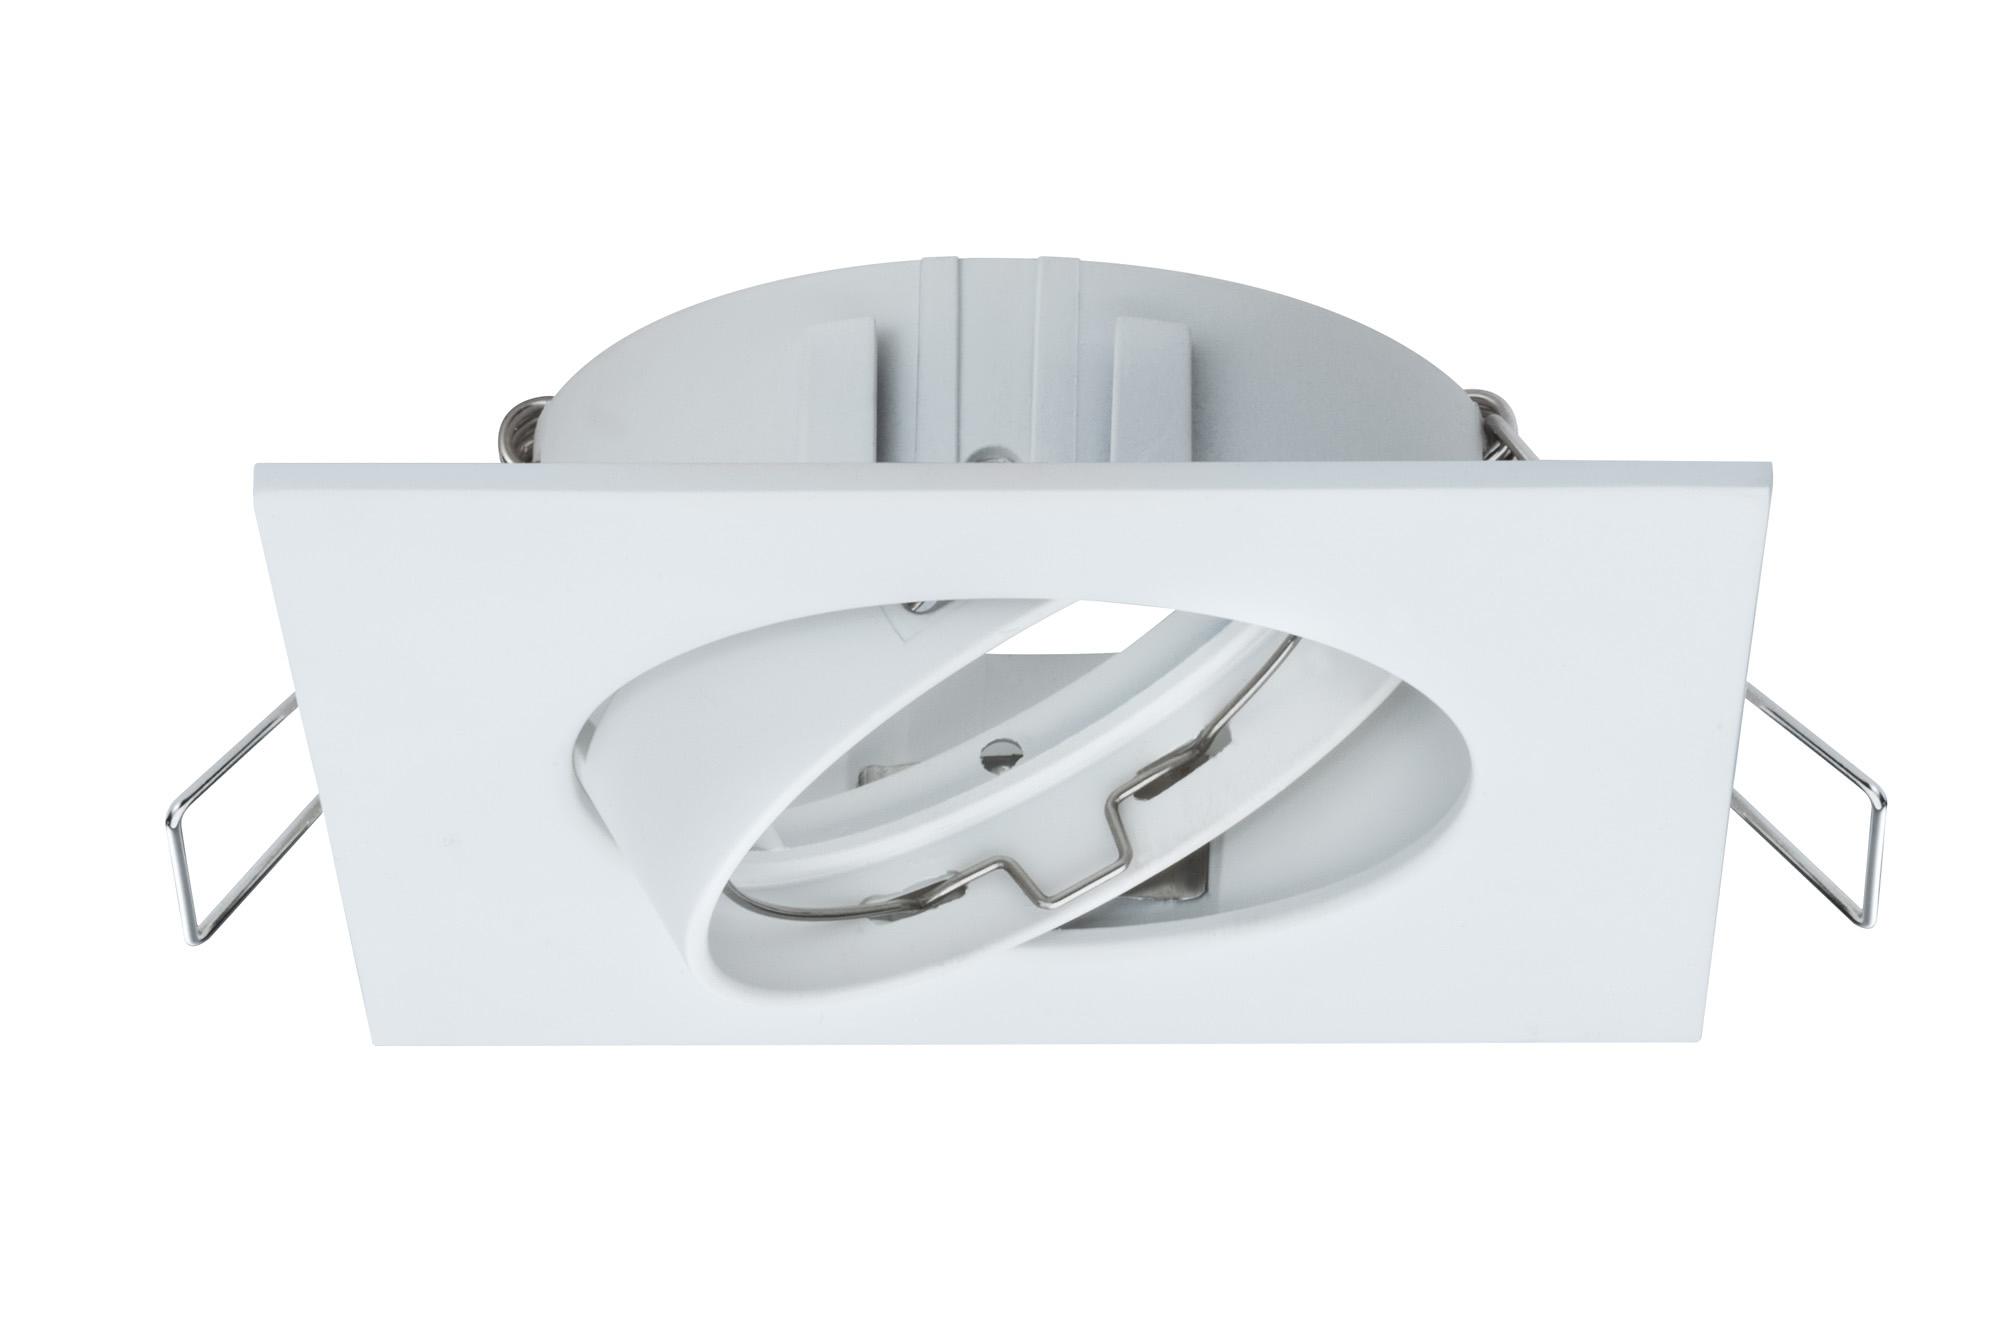 Paulmann. 92591 Светильник встр комплект 3 шт Spot Quadro schw, белый